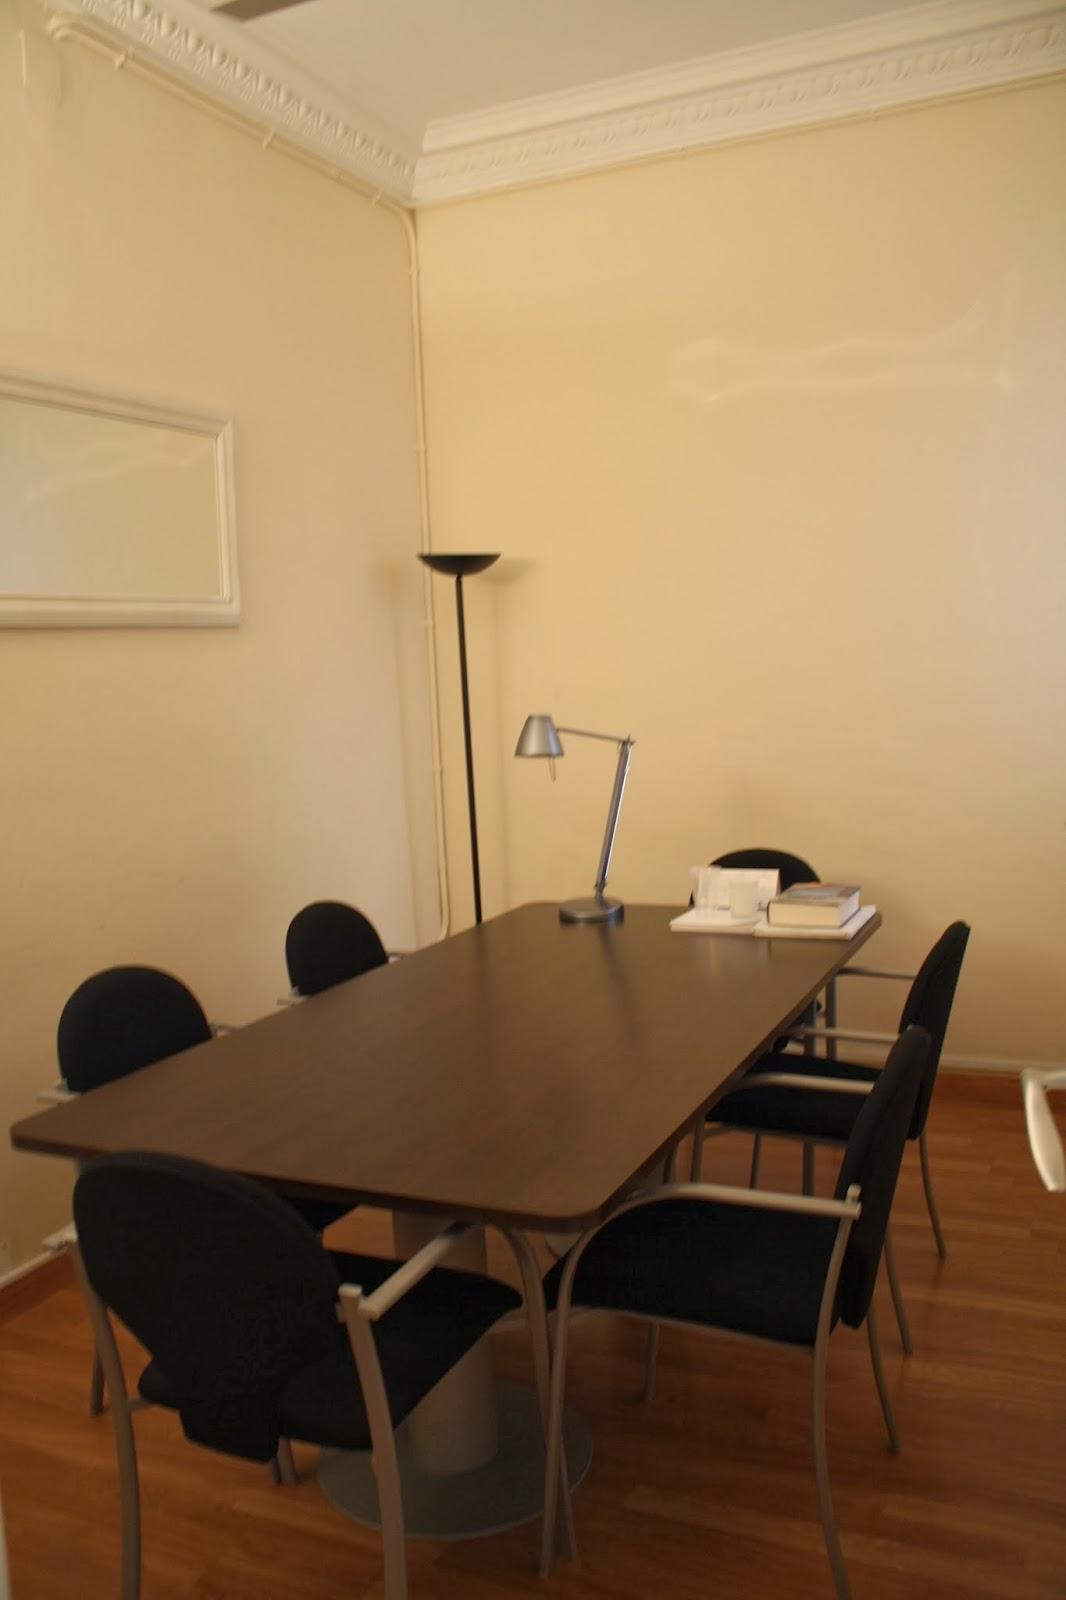 Rn Office Jobs Palm Beach County